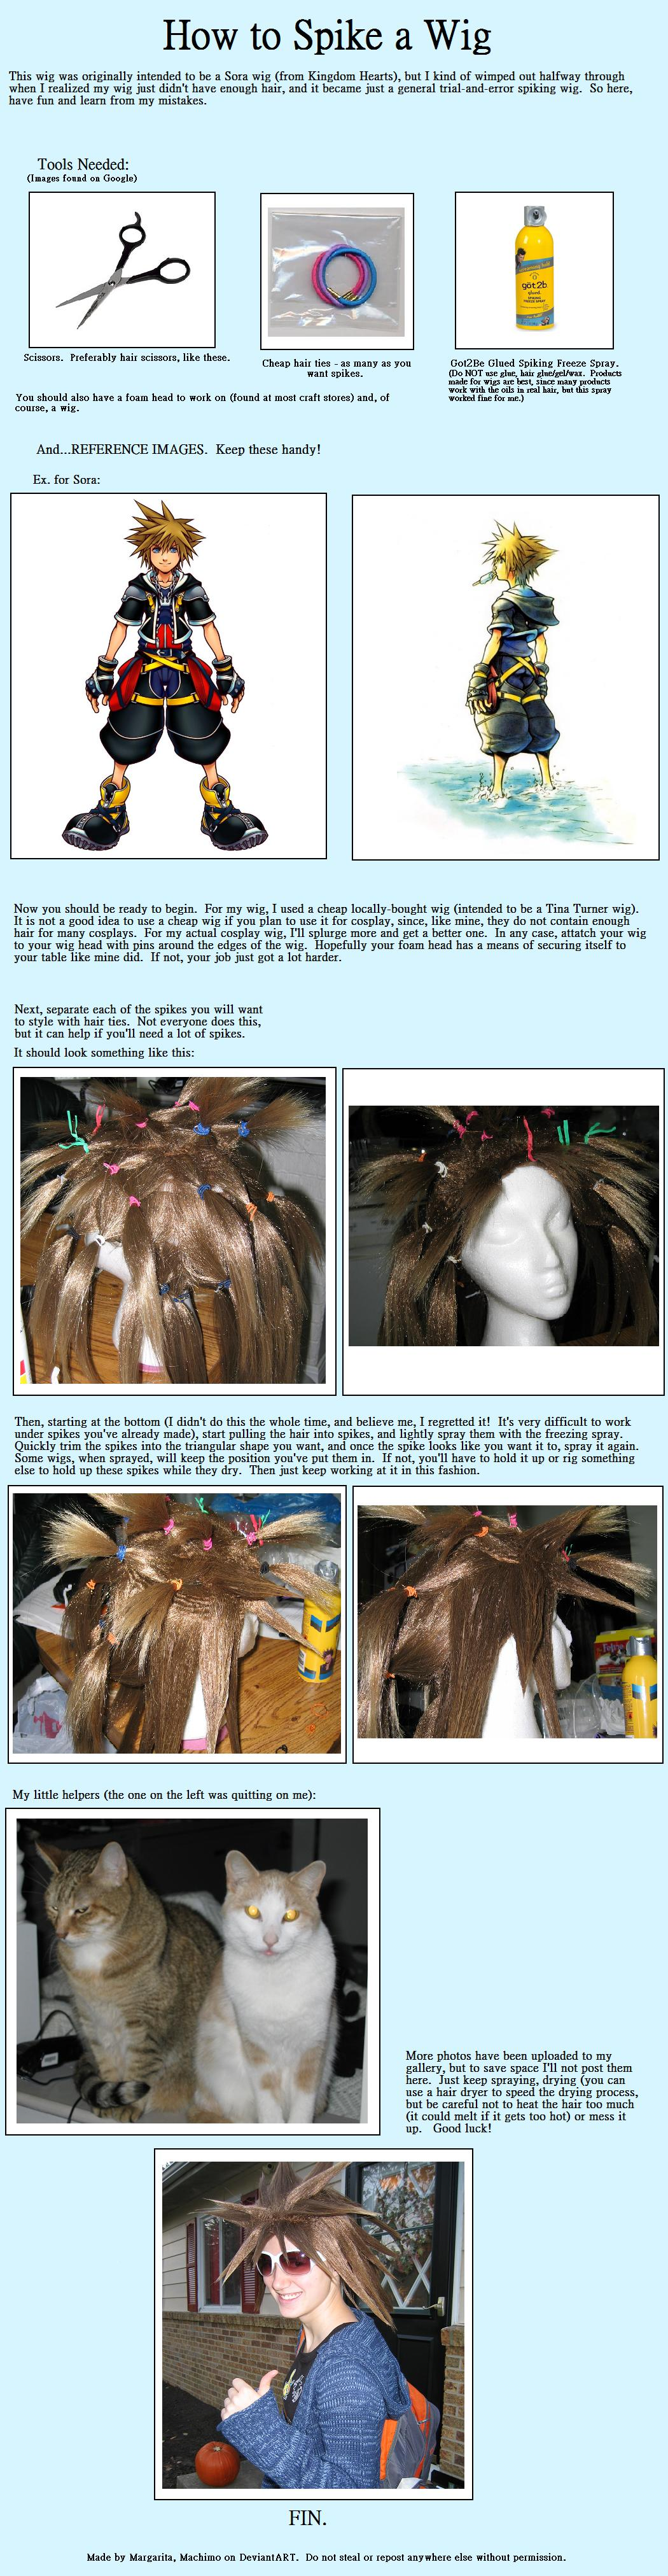 Tutorial - Spiking a Wig